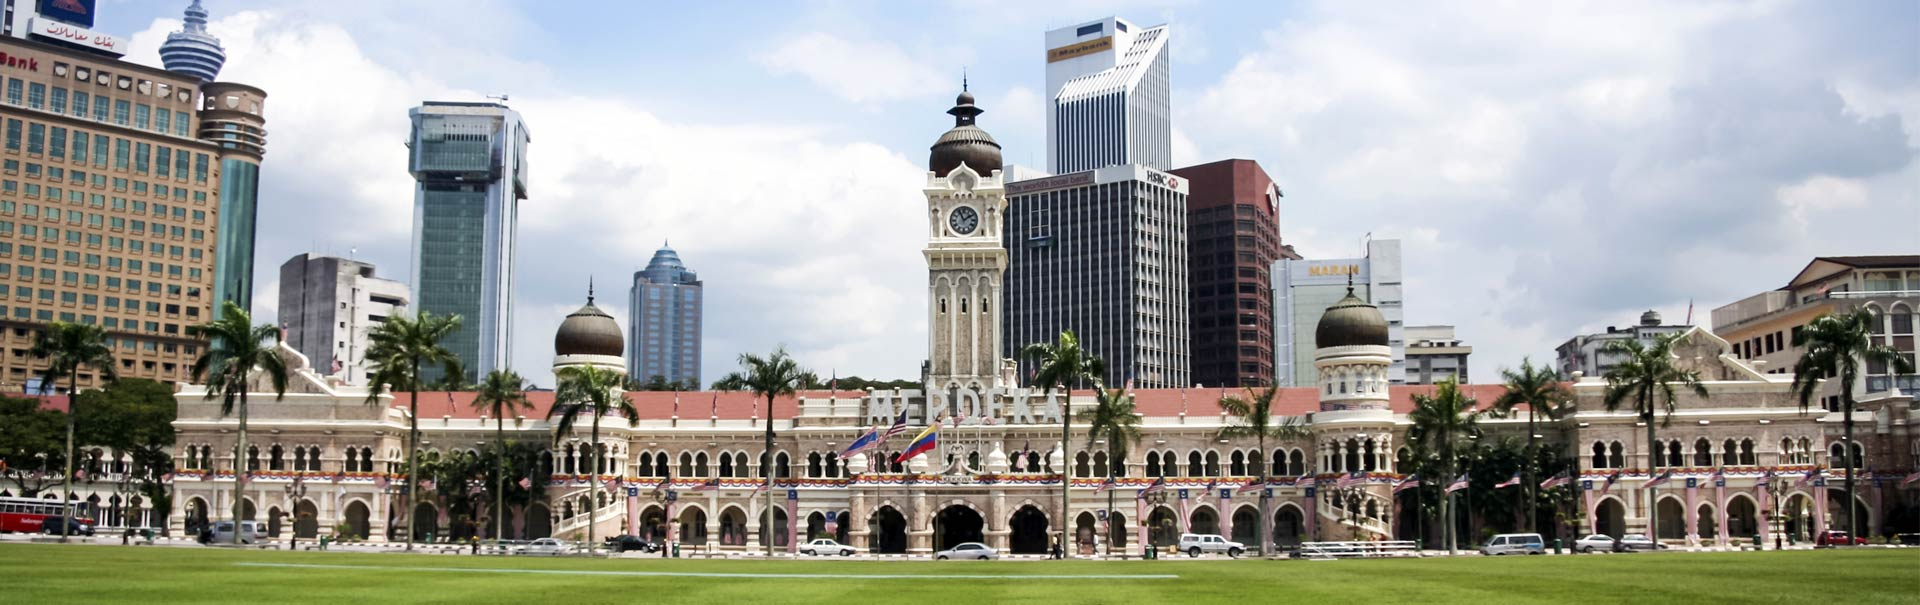 7 Days 6 Nights Seniors Special Singapore Malaysia Open Trip Kuala Lumpur Aszm Banner